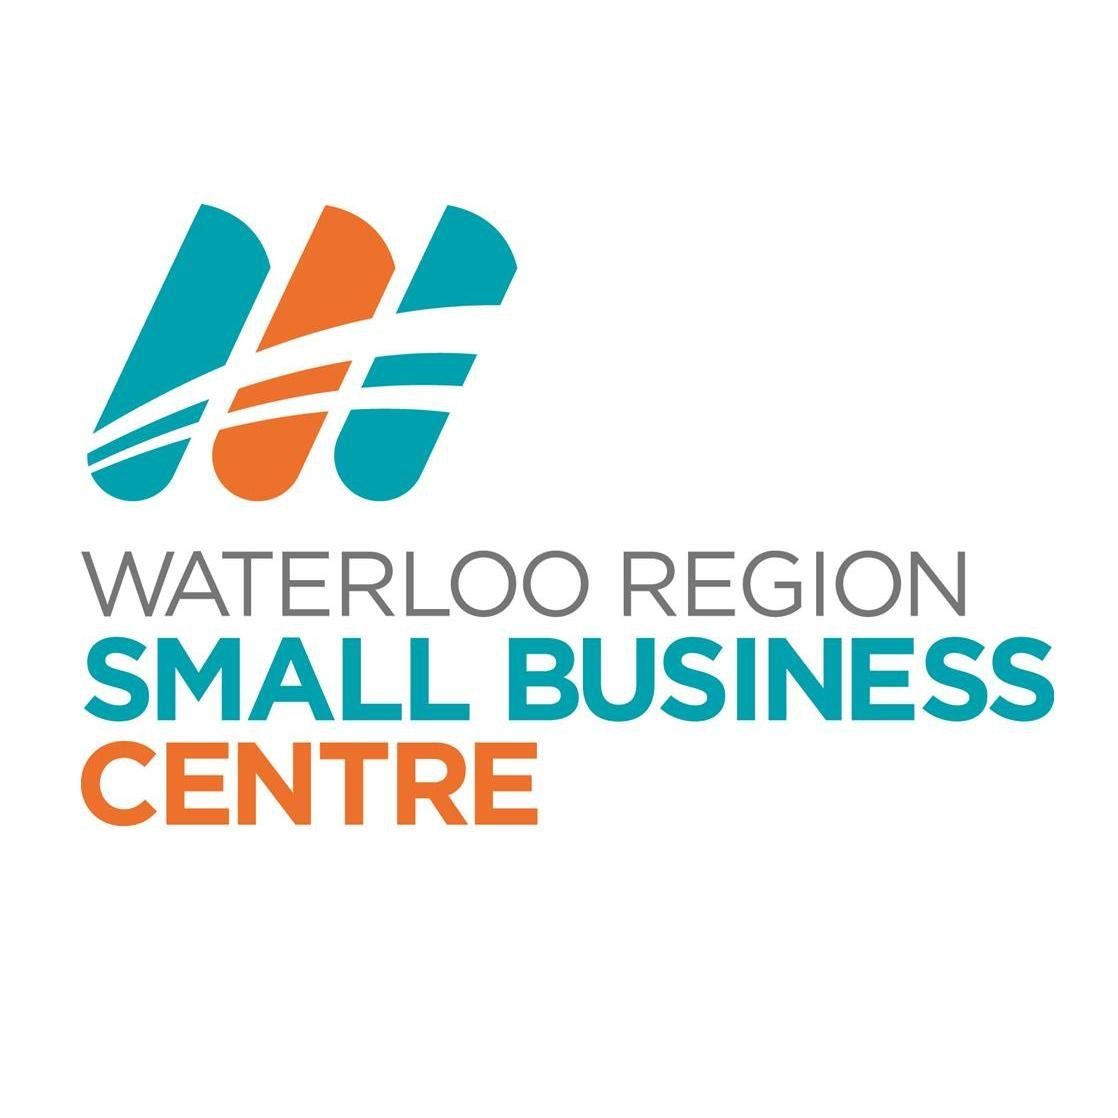 Waterloo Region Small Business Centre.jpeg